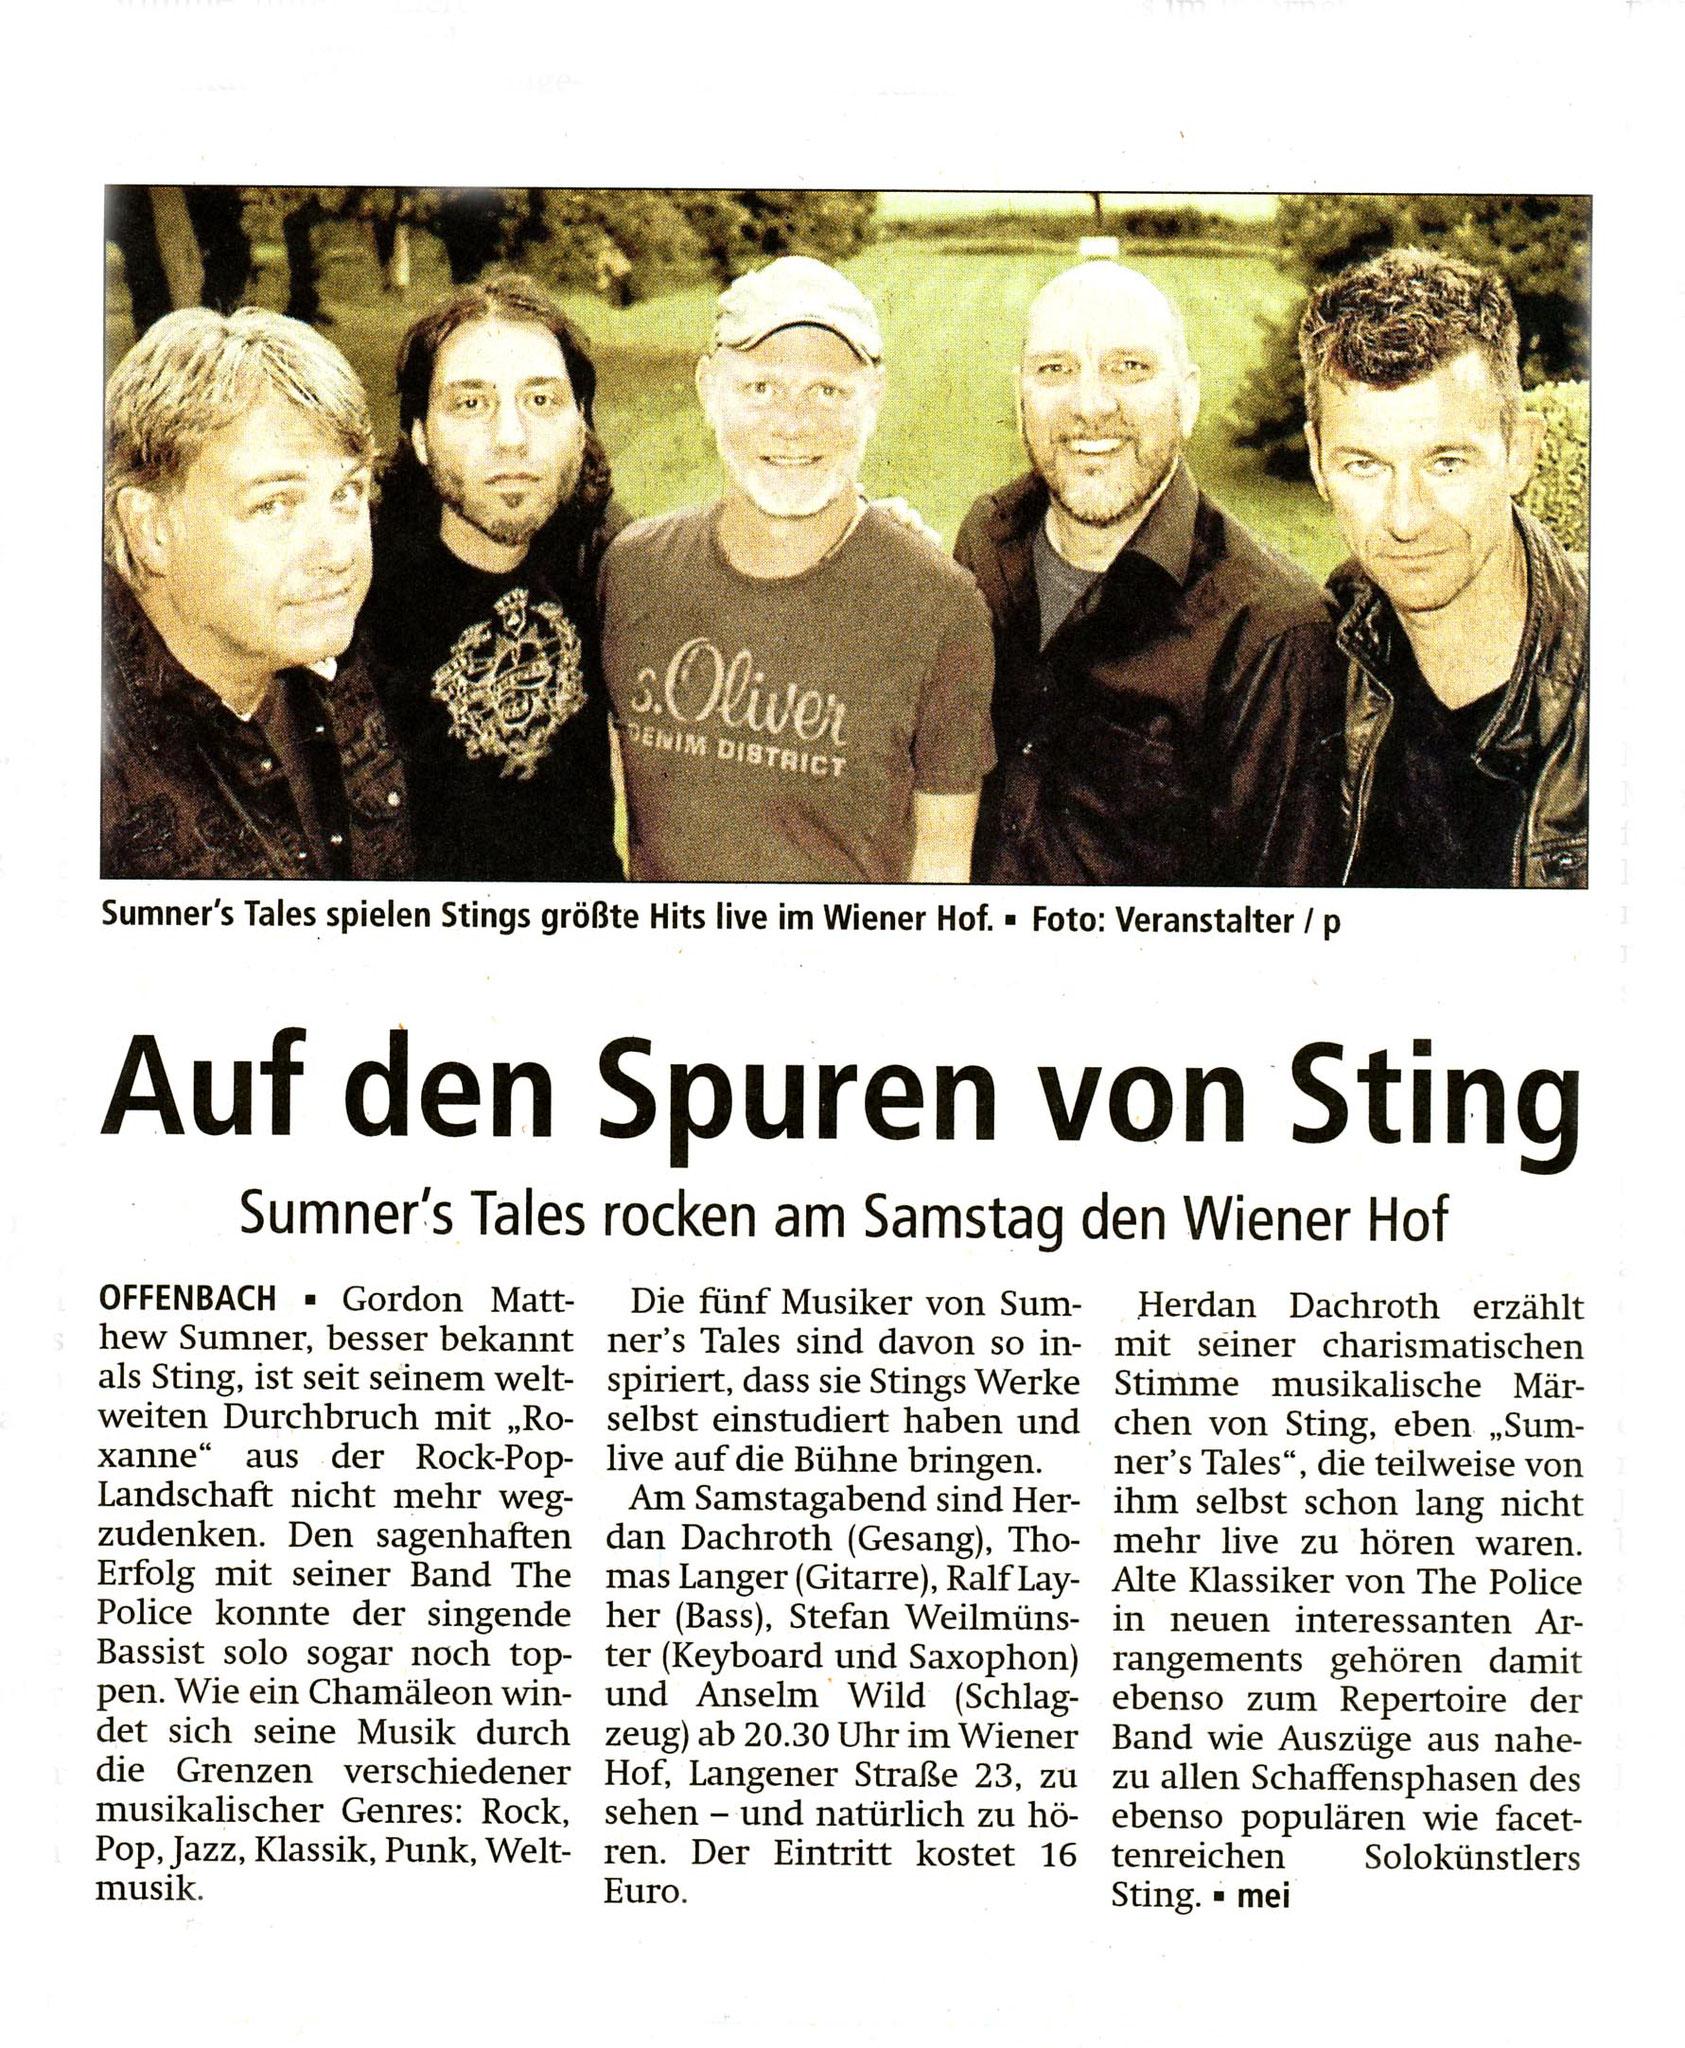 Offenbach Post, 23. März 2018